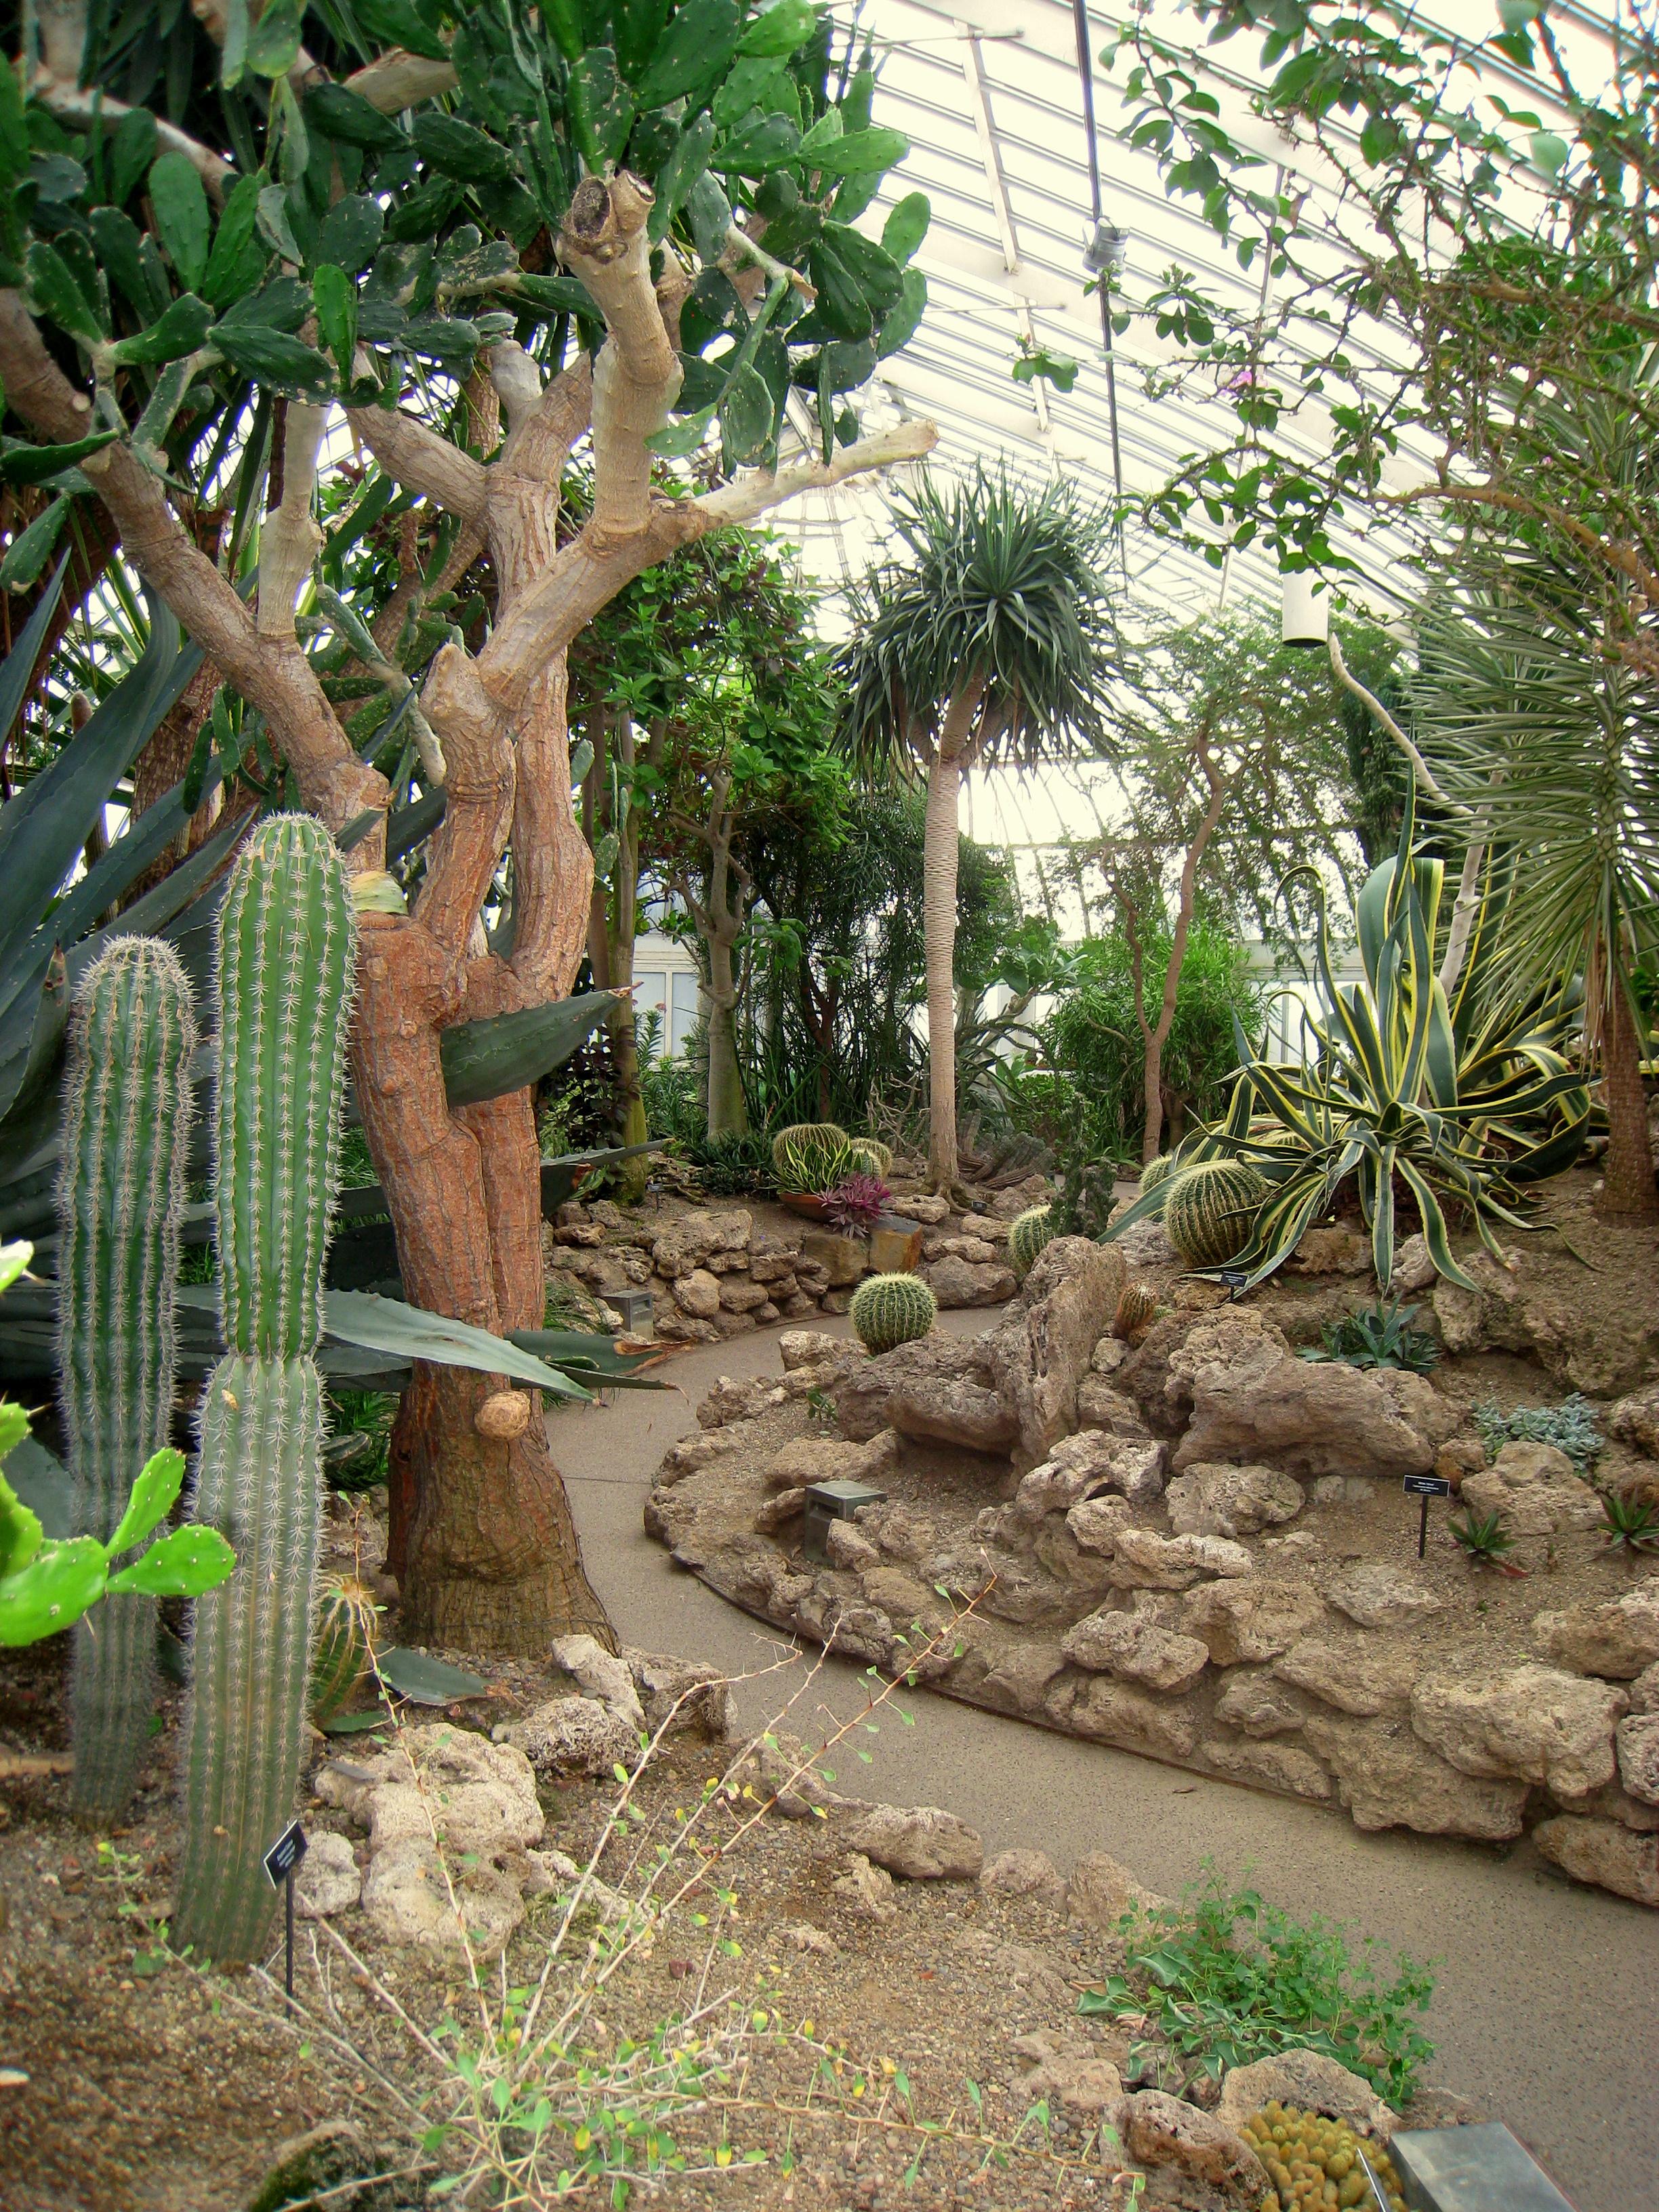 File:Phipps Conservatory & Botanical Gardens 208.jpg - Wikimedia Commons